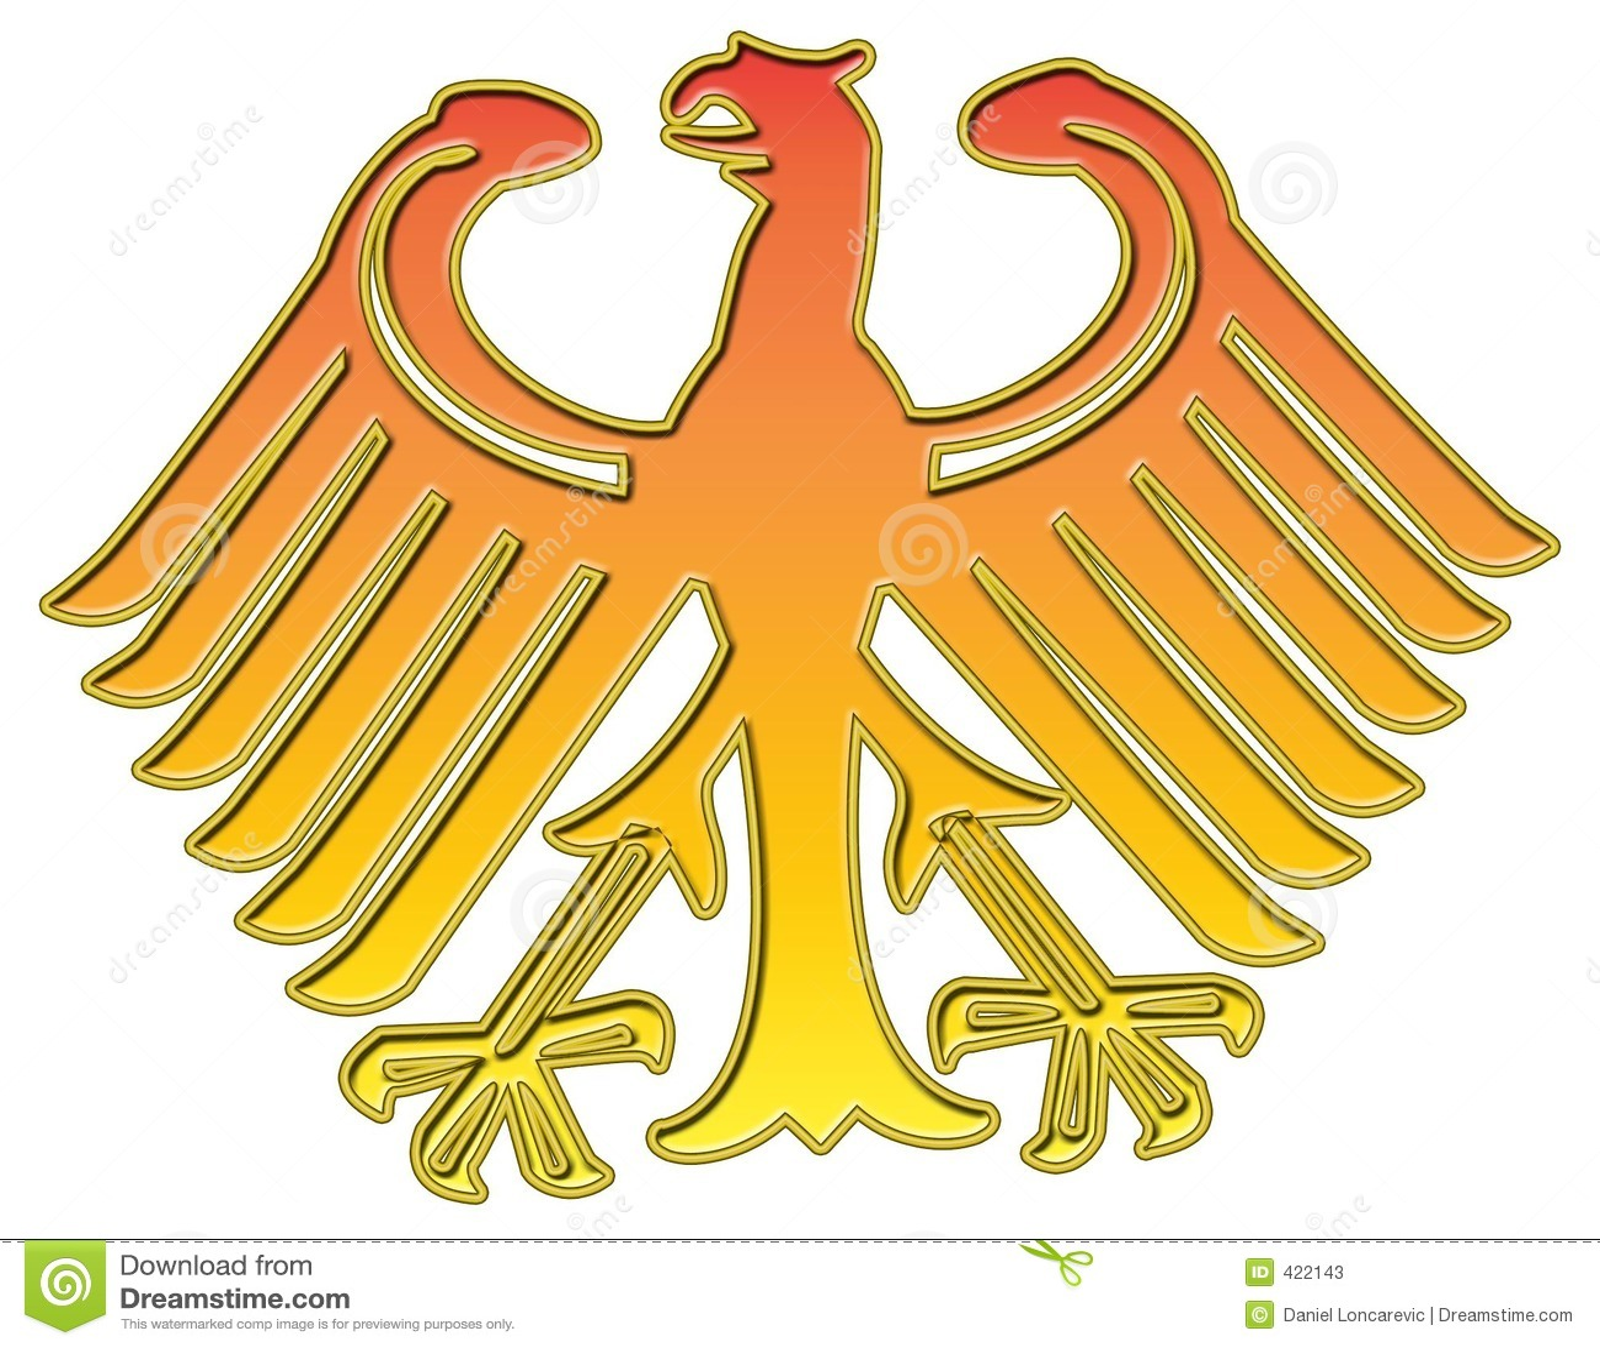 German eagle symbol - photo#23